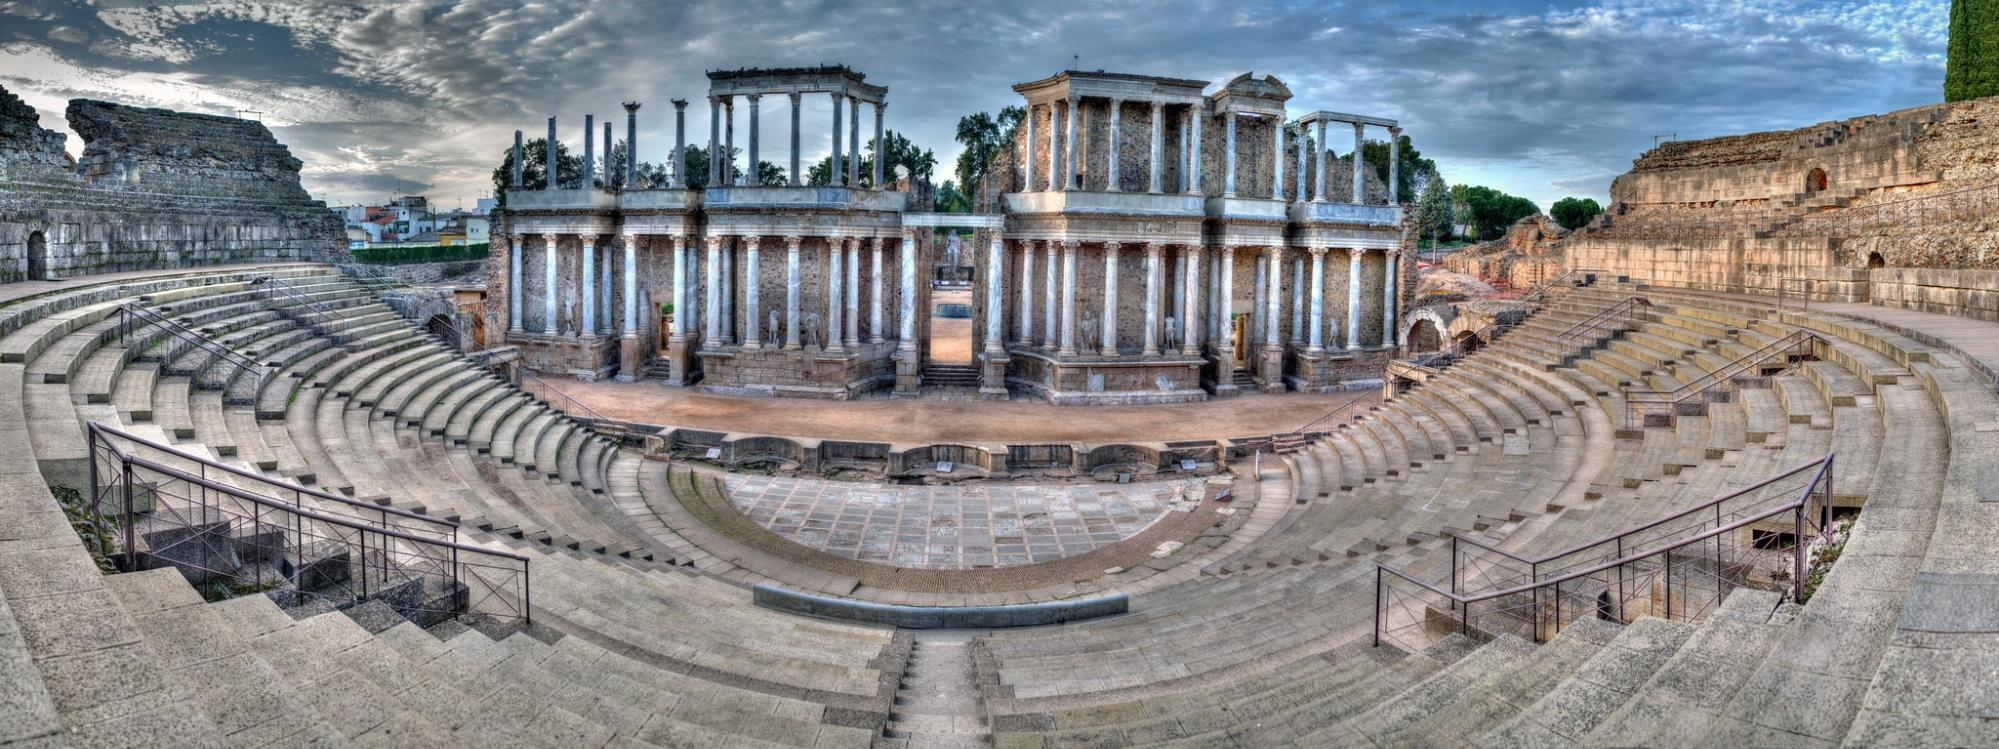 The Roman theatre of Mérida